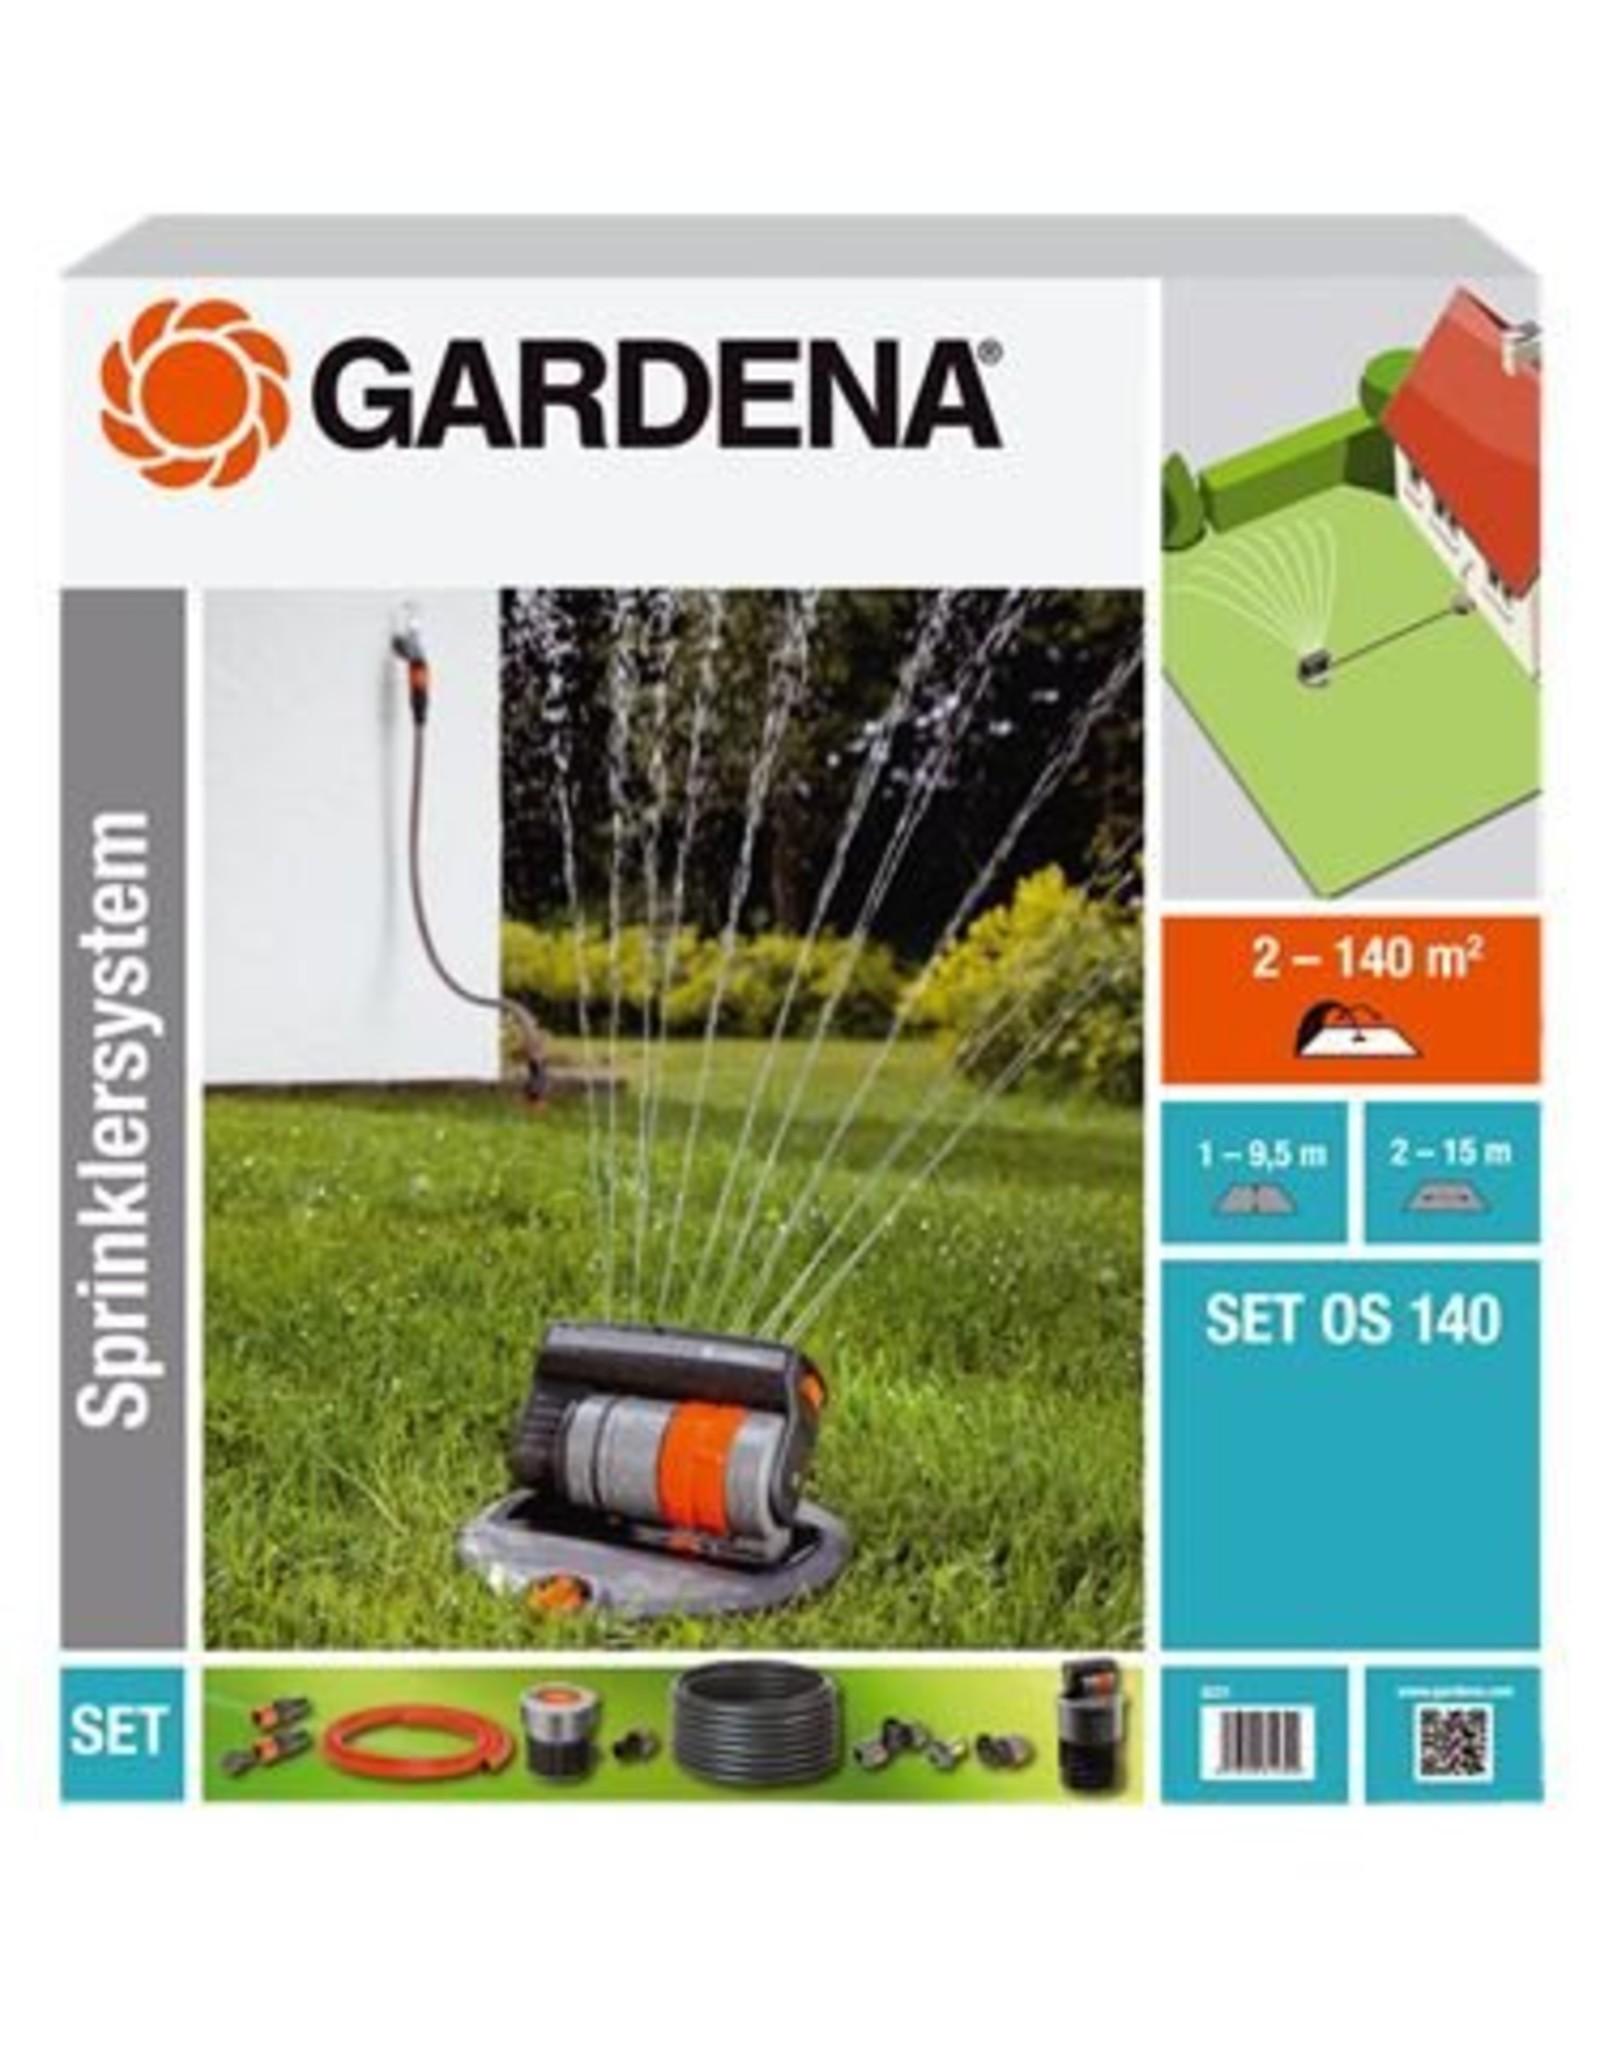 Gardena Gardena OS 140 Pulserende tuinsprinkler